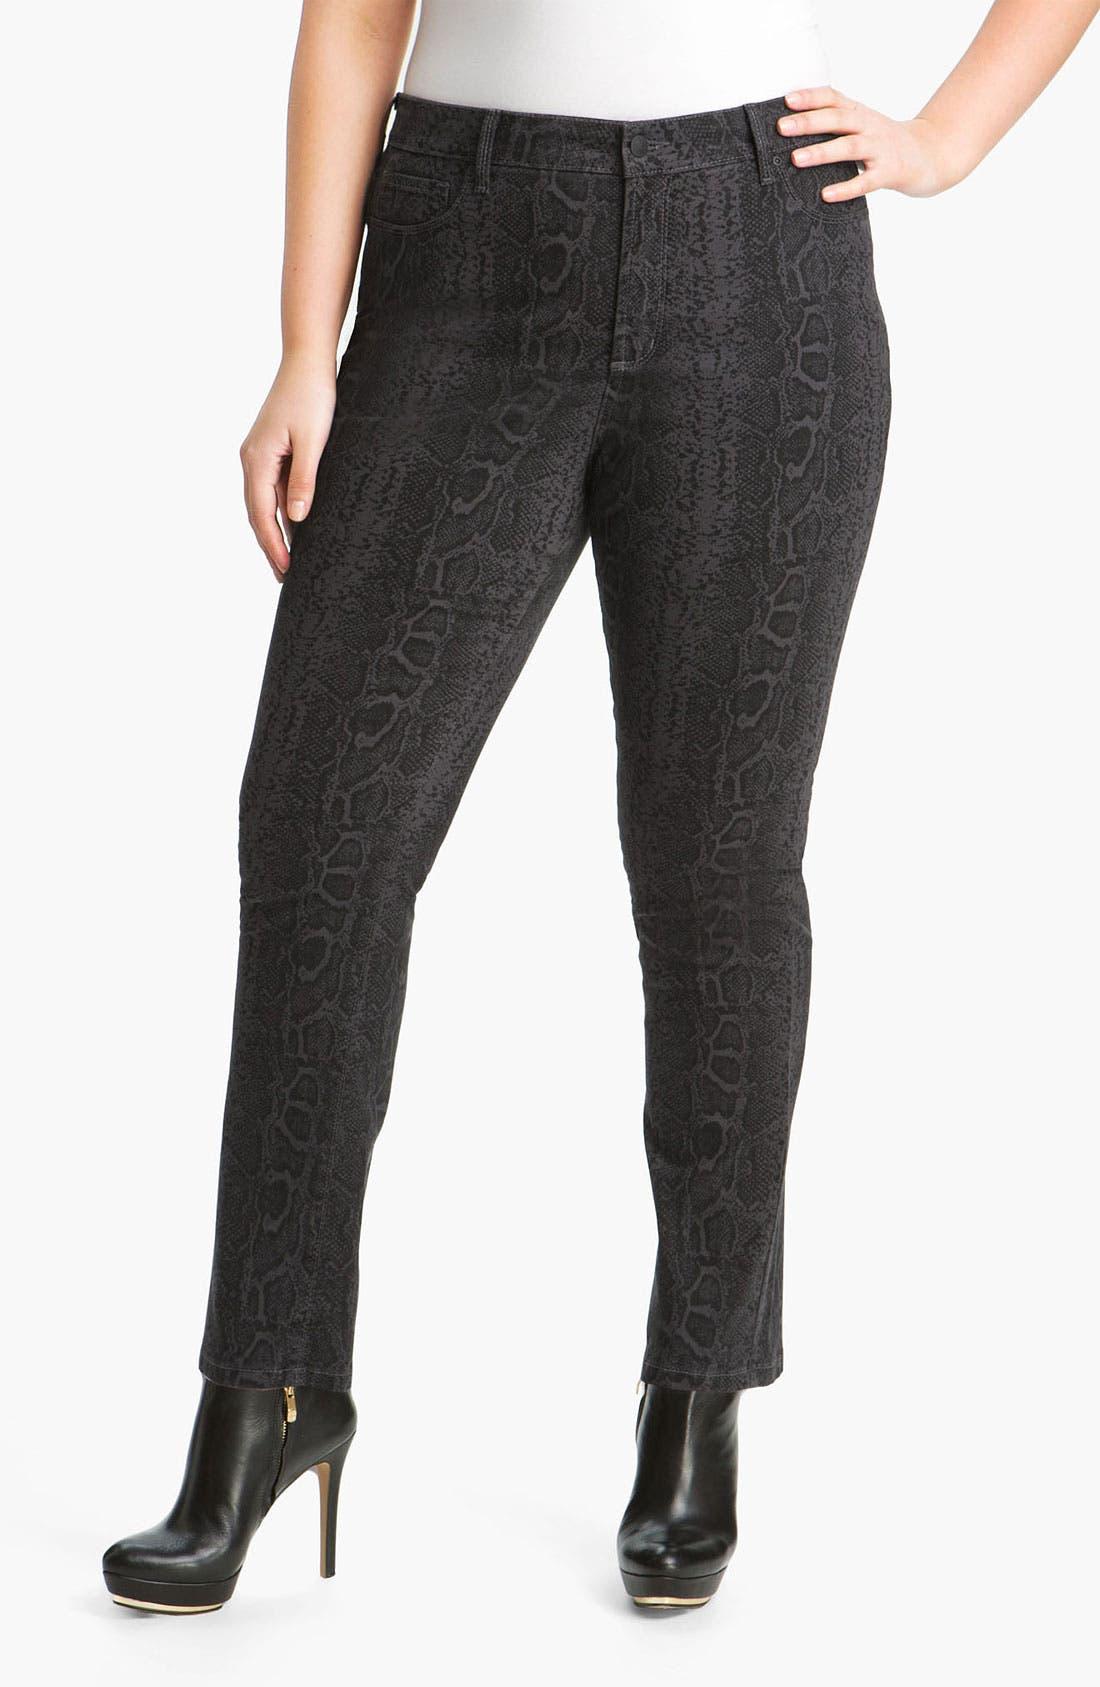 Alternate Image 1 Selected - NYDJ 'Sheri' Python Print Skinny Twill Jeans (Plus)